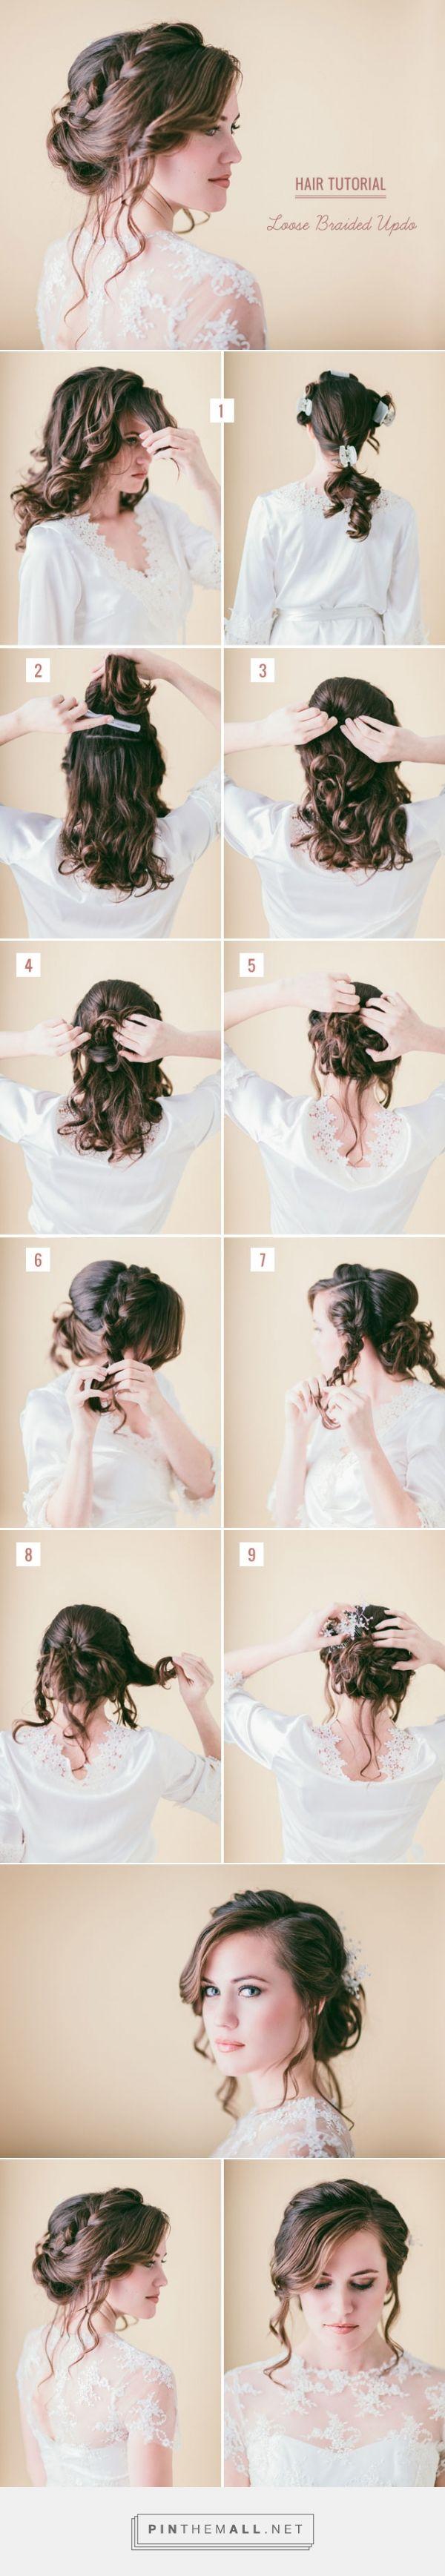 Hair Tutorial: Loose Braided Updo   Green Wedding Shoes Wedding Blog   Wedding T...